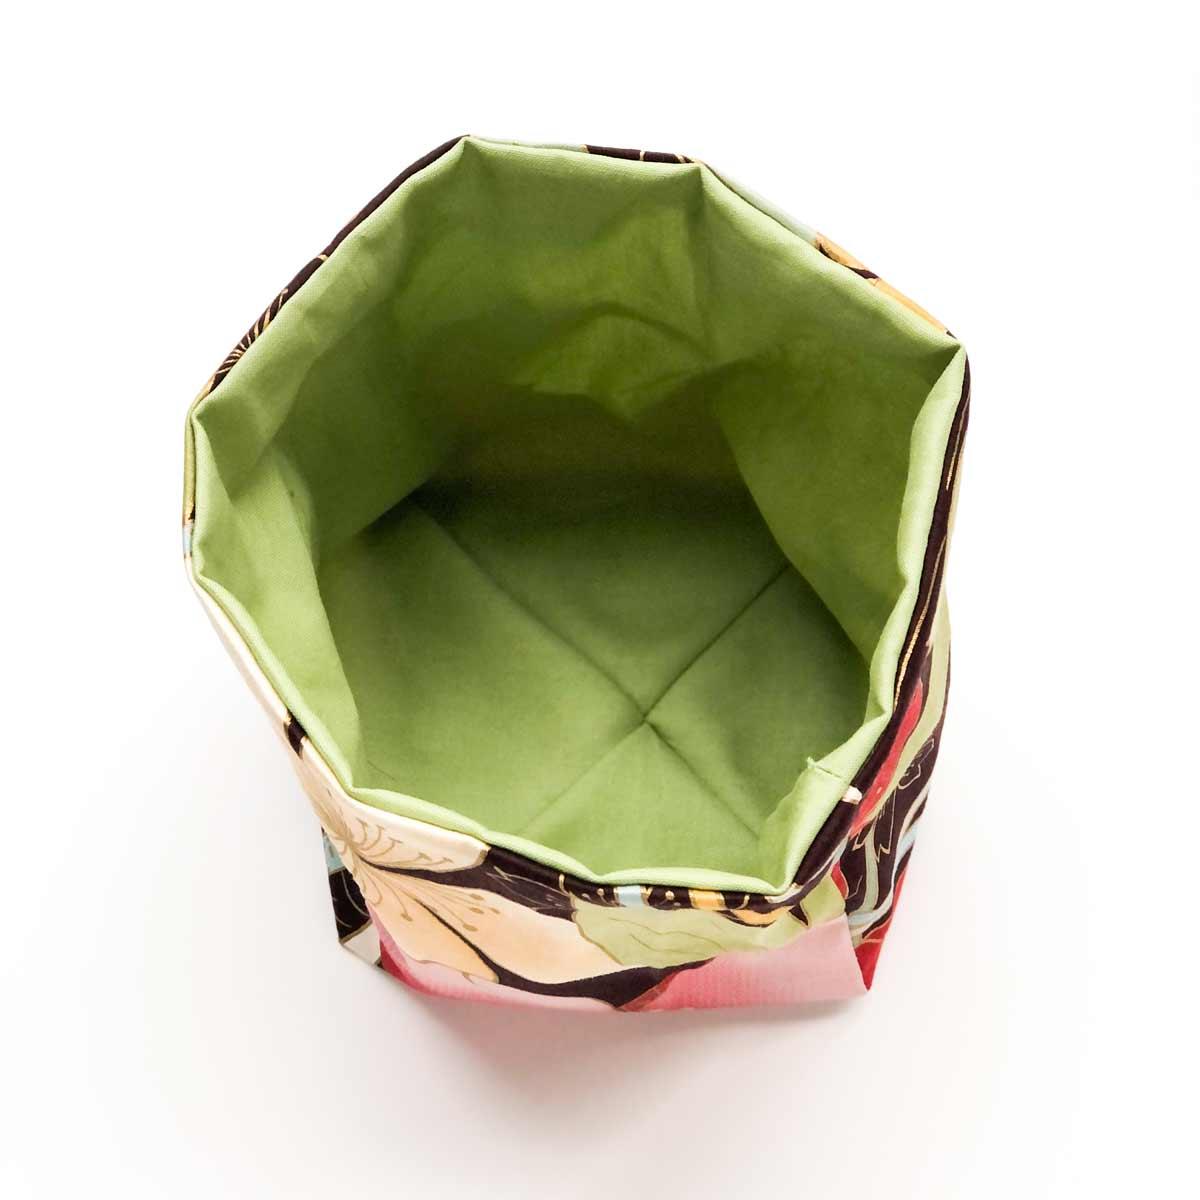 DIY dice bag lining and exterior sewn together